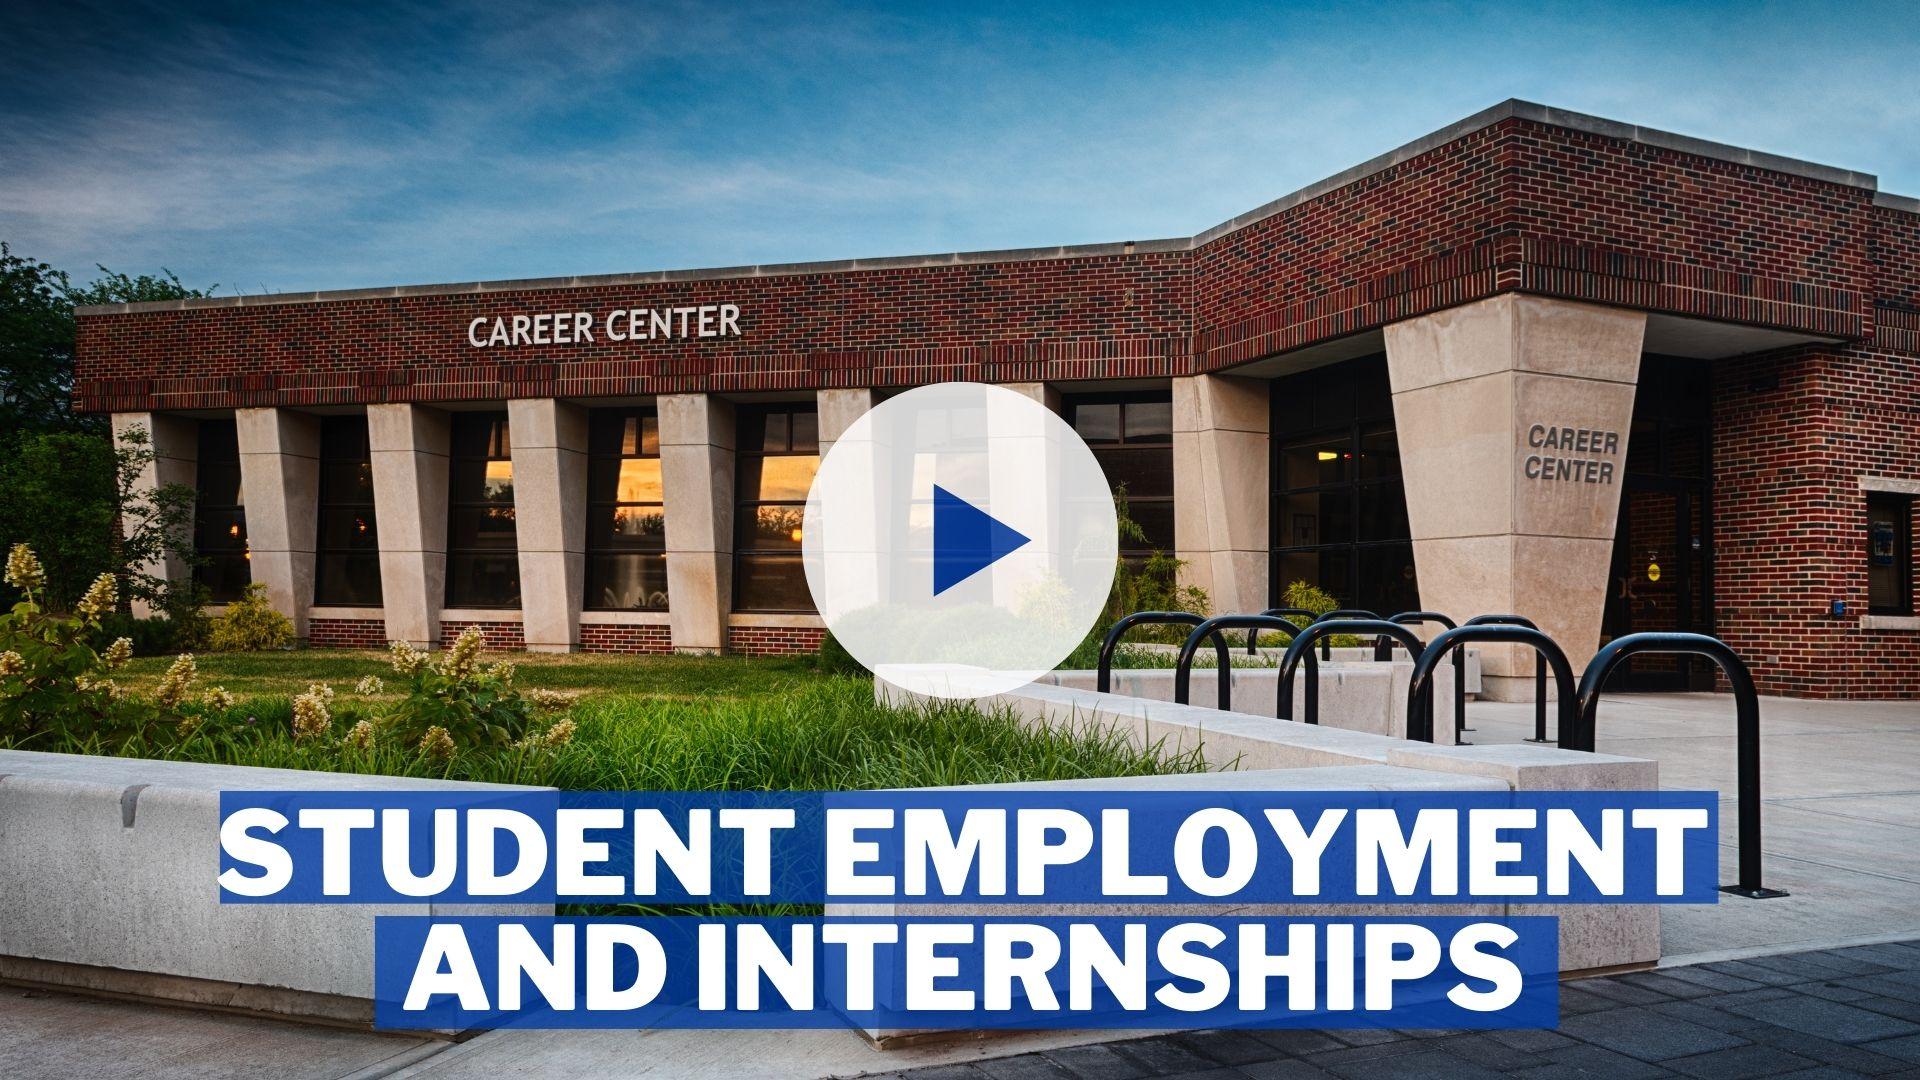 Student Employment and Internships